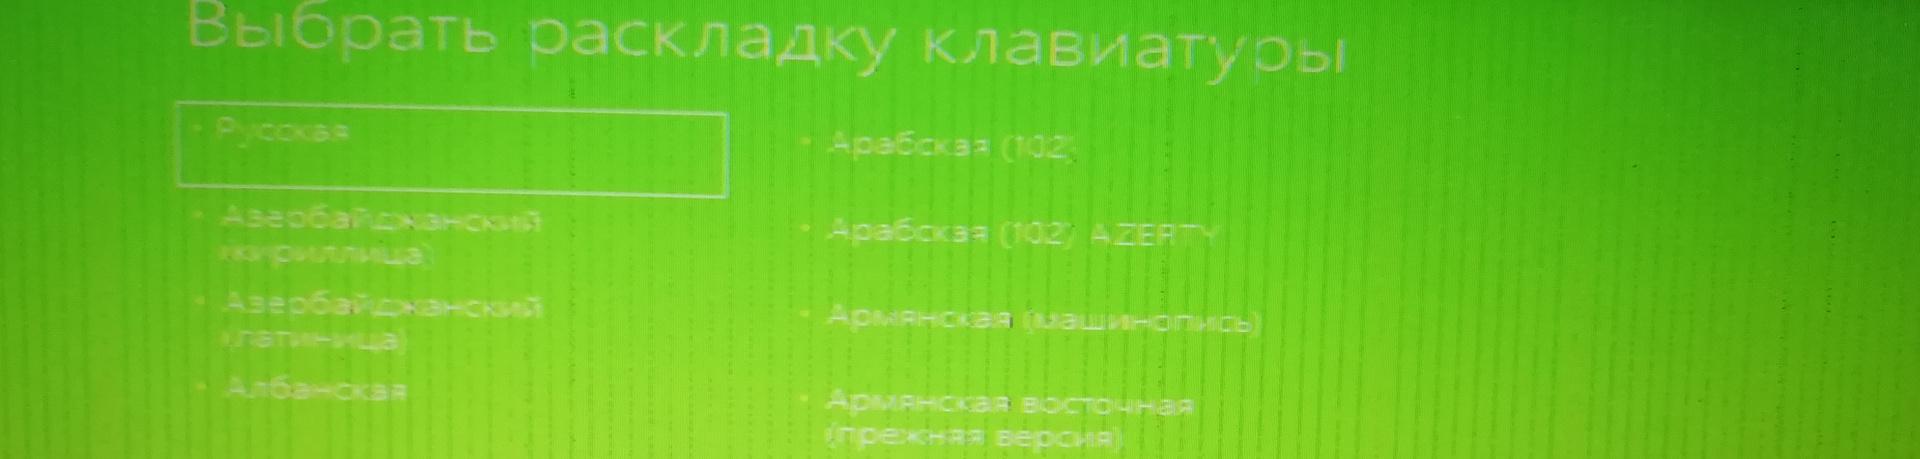 60e5dc5a76f00165153794.jpeg